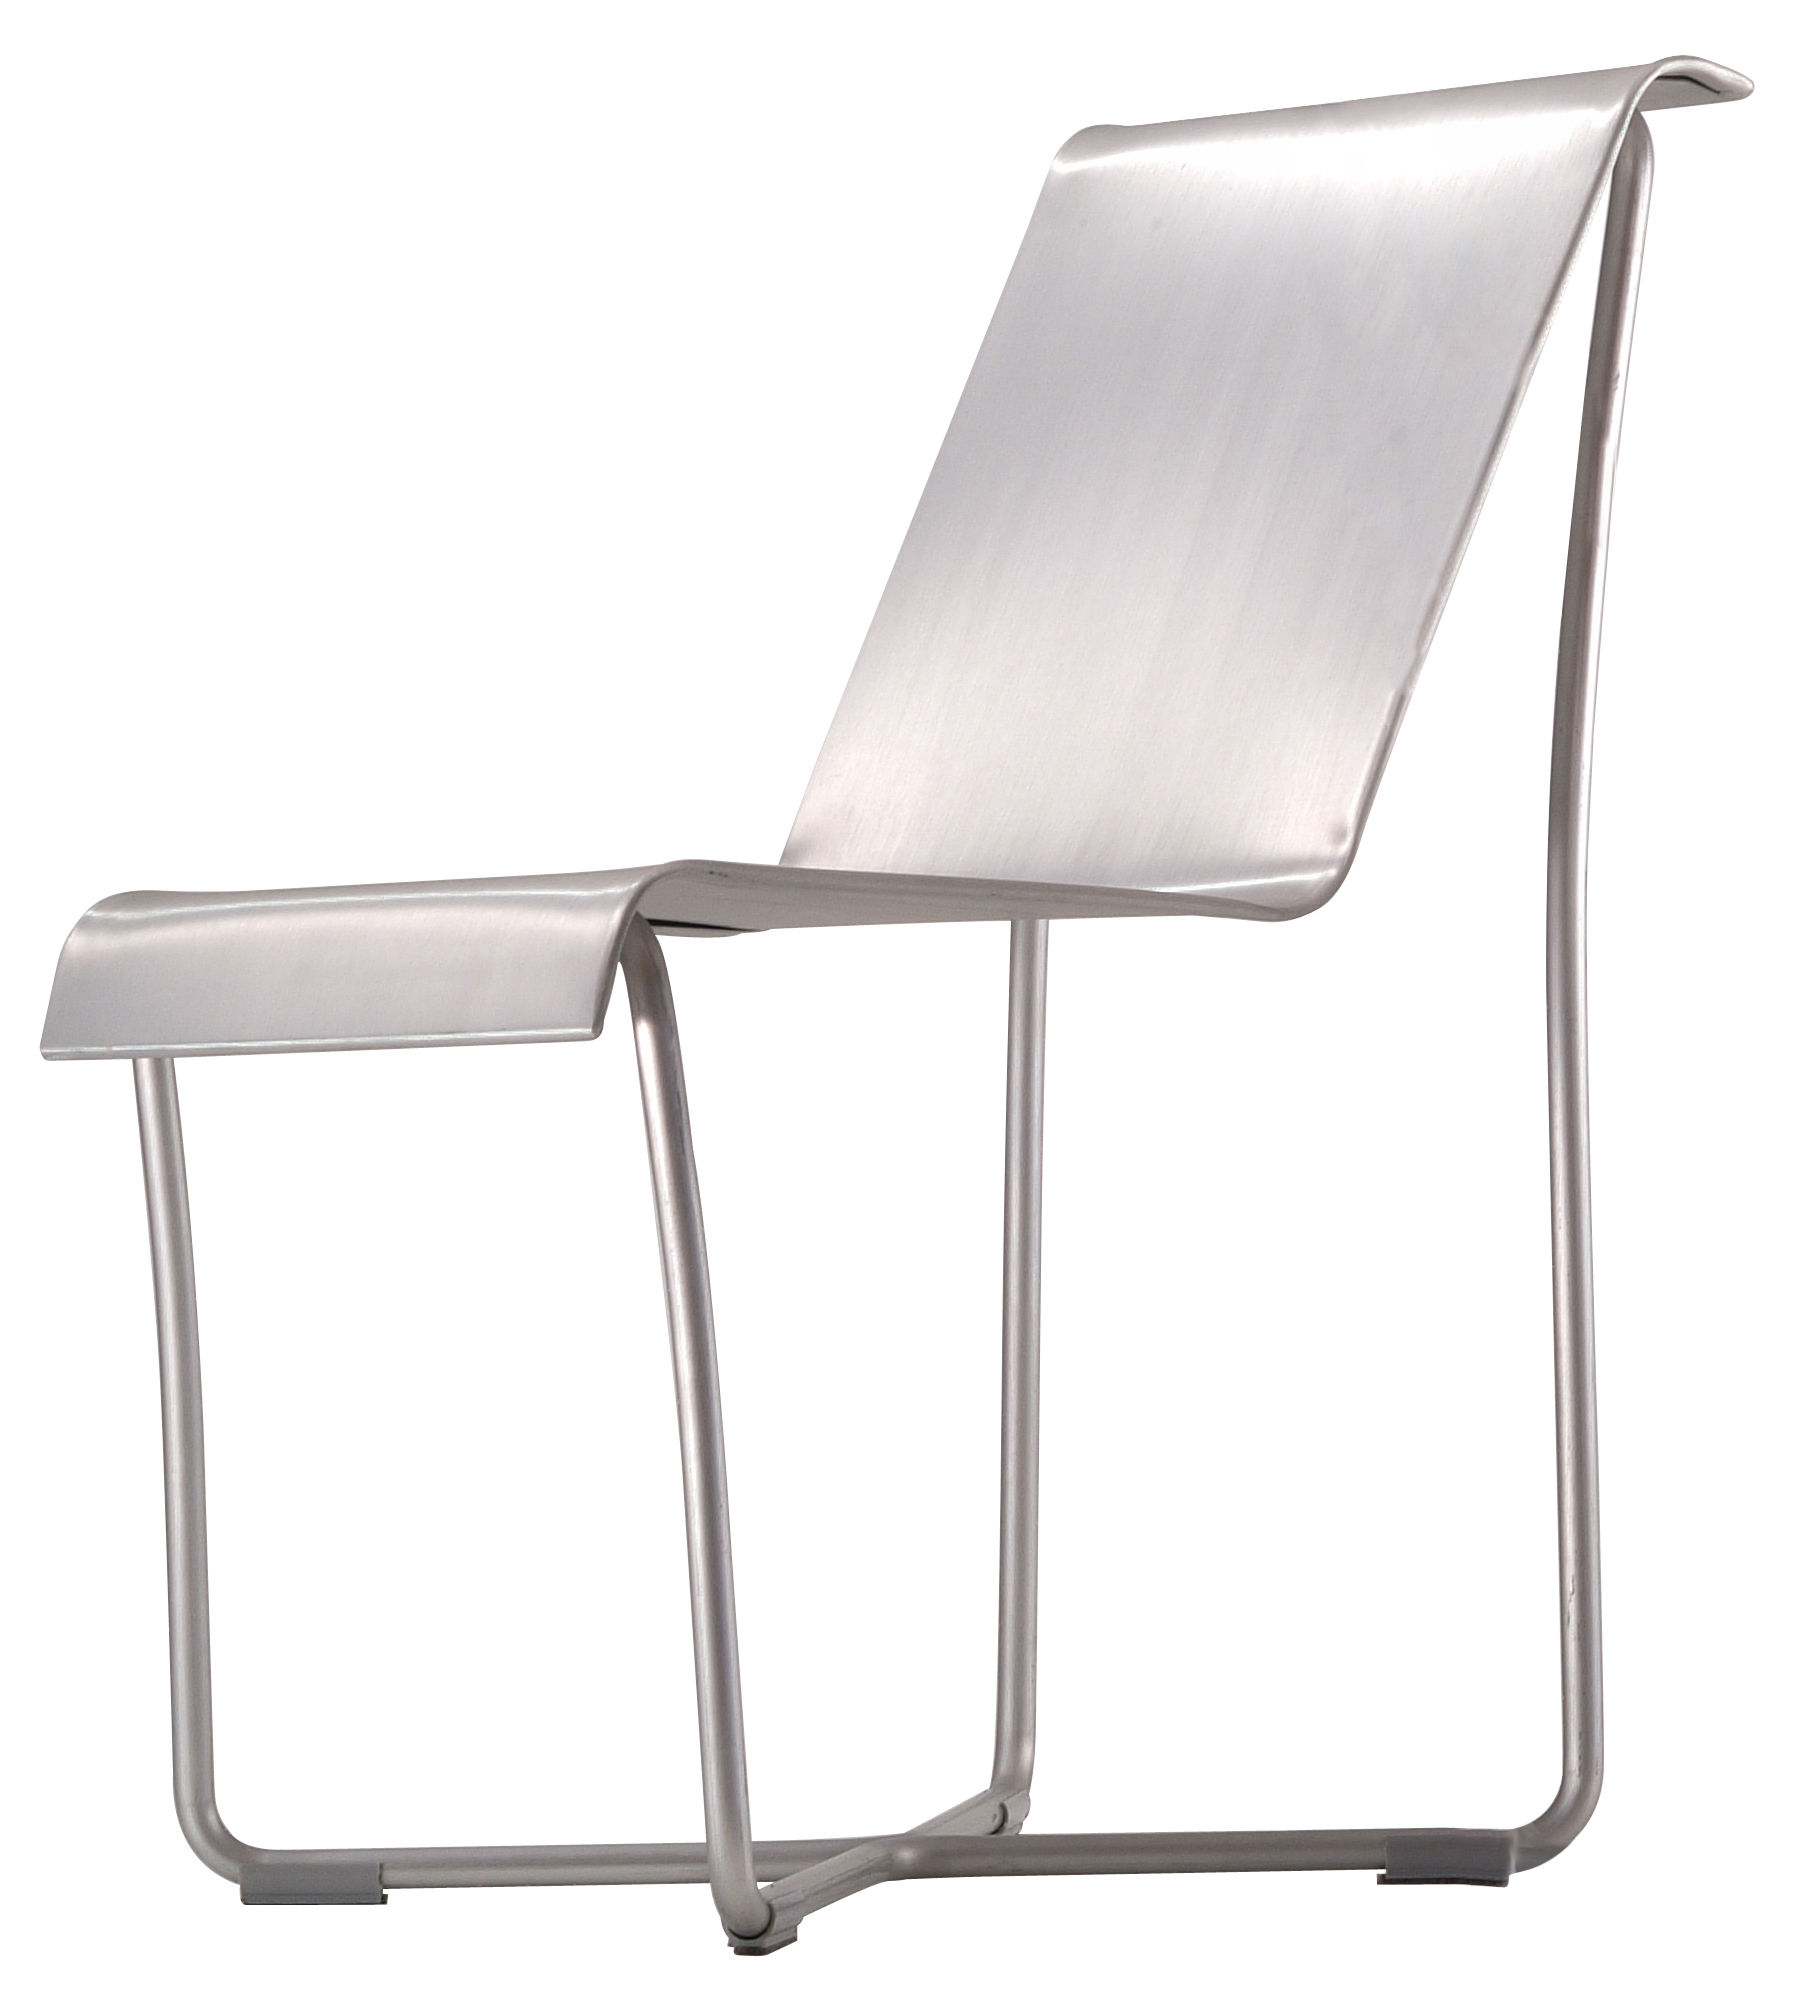 Mobilier - Chaises, fauteuils de salle à manger - Chaise Superlight Chair / Aluminium - Emeco - Aluminium mat - Aluminium